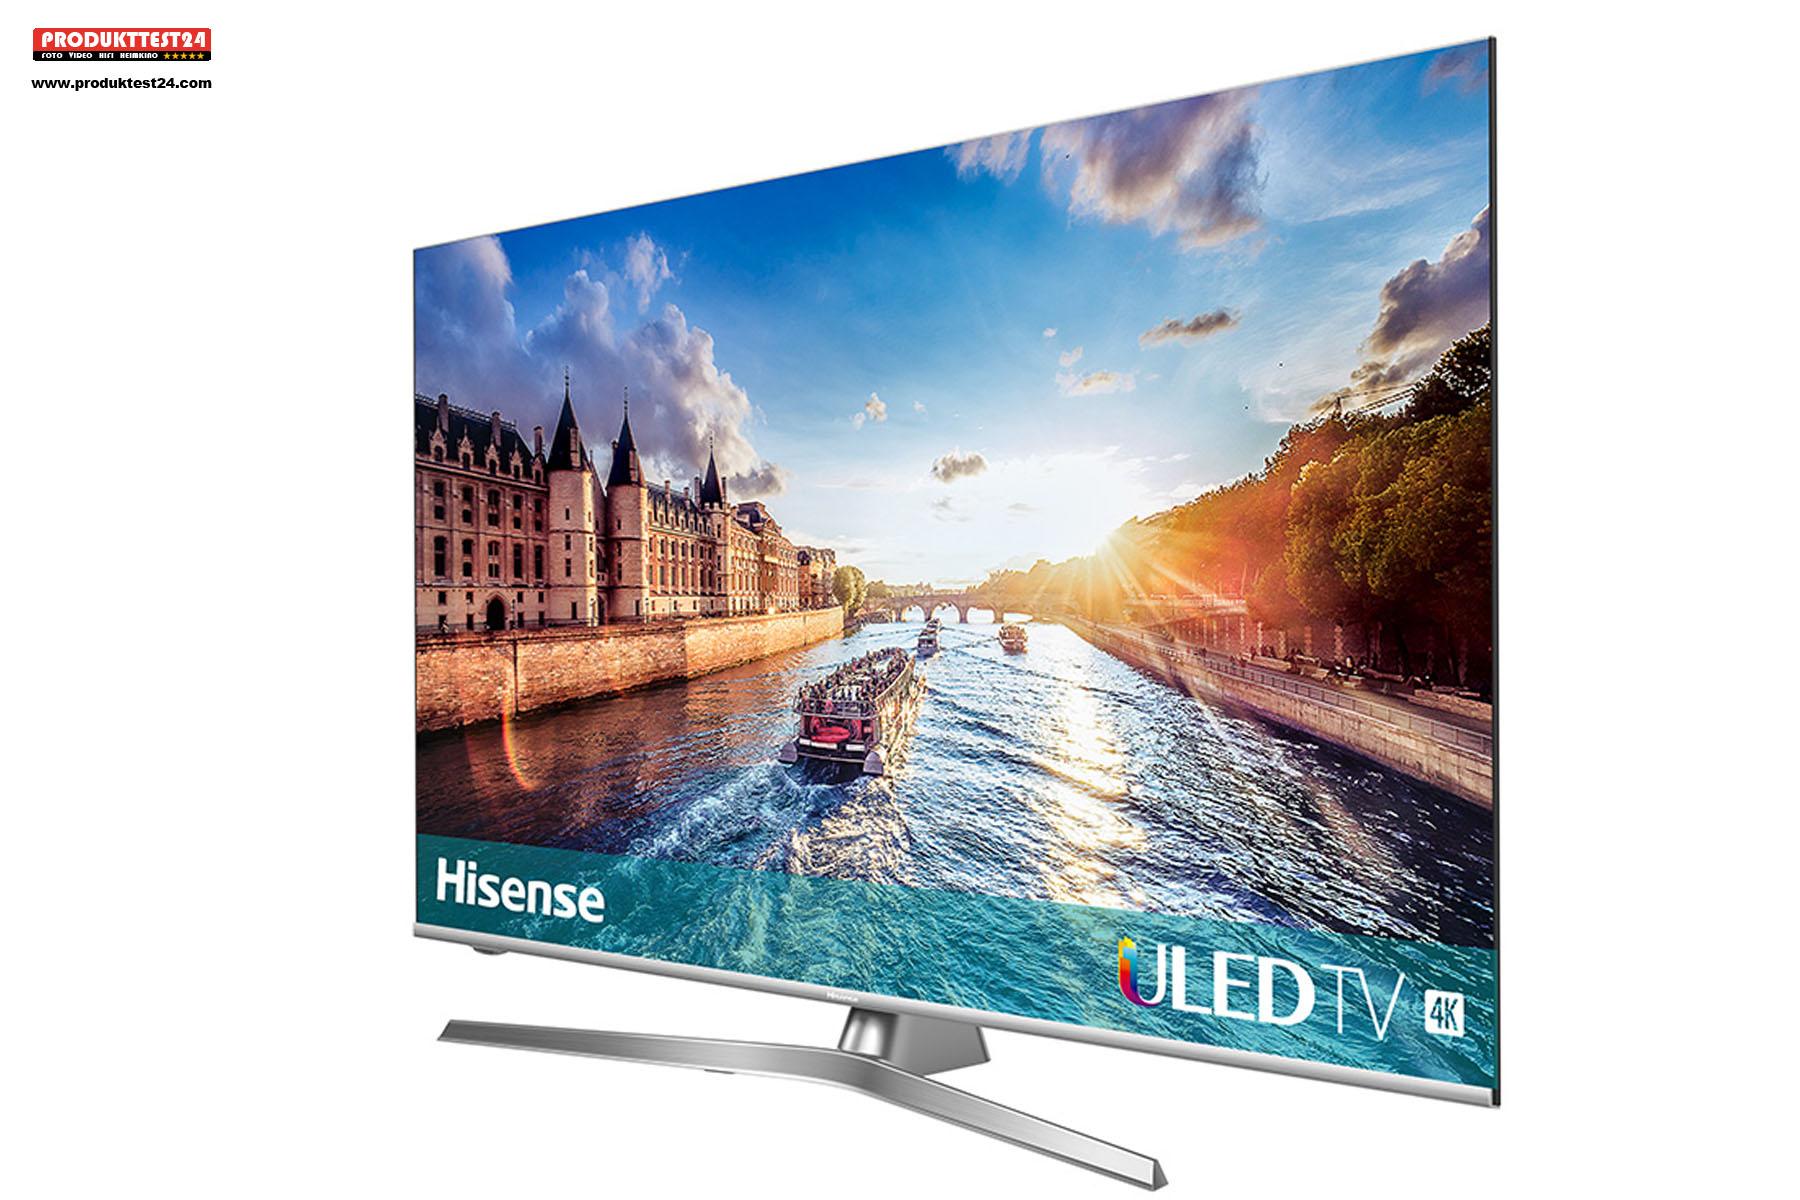 Hisense H65U8B ULED 4K Fernseher